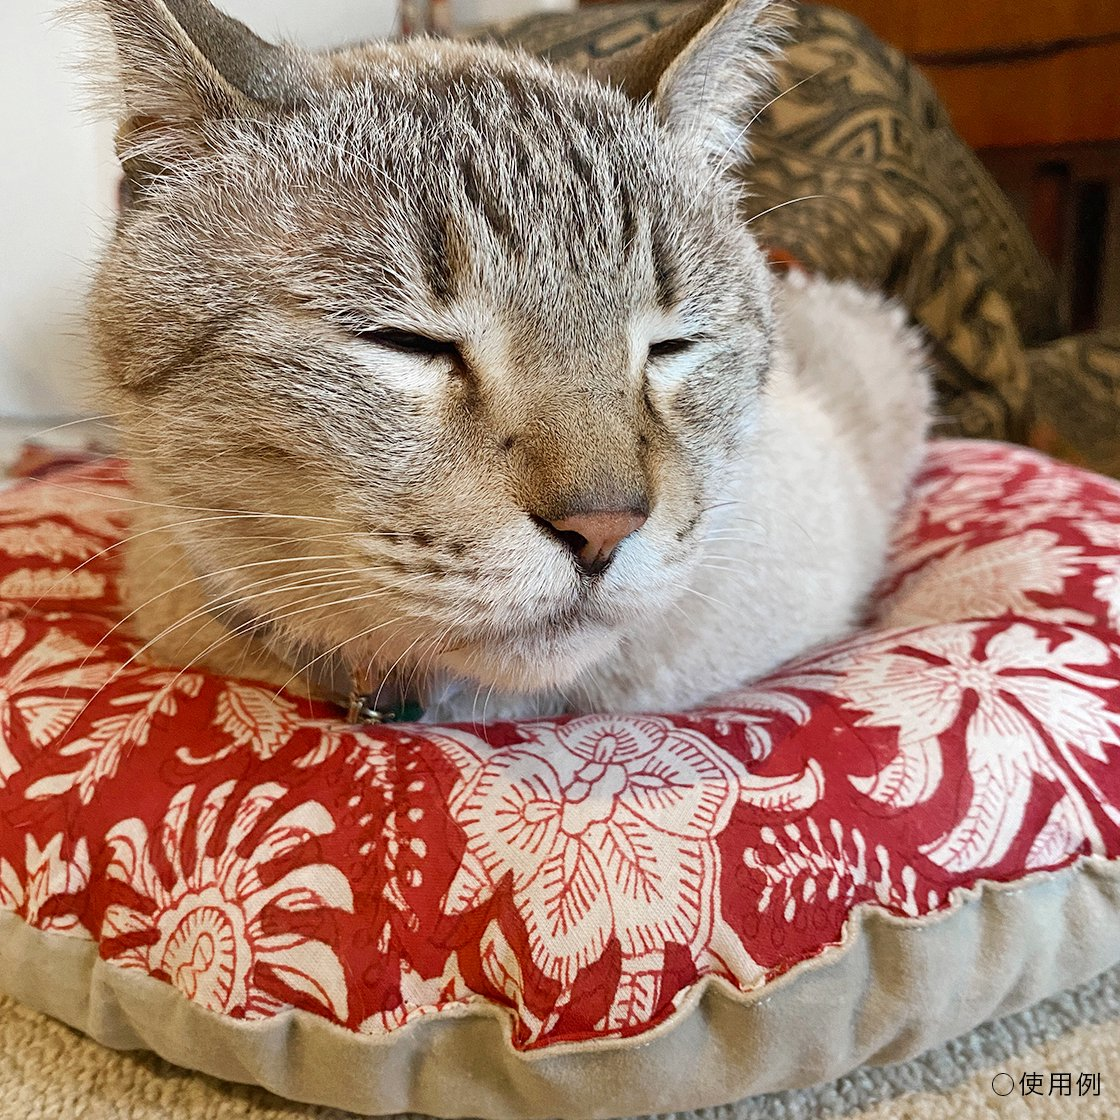 <img class='new_mark_img1' src='https://img.shop-pro.jp/img/new/icons57.gif' style='border:none;display:inline;margin:0px;padding:0px;width:auto;' />OZABUクッション-Lサイズ【ハンドブロック/レッド系 #2】 /For Cat